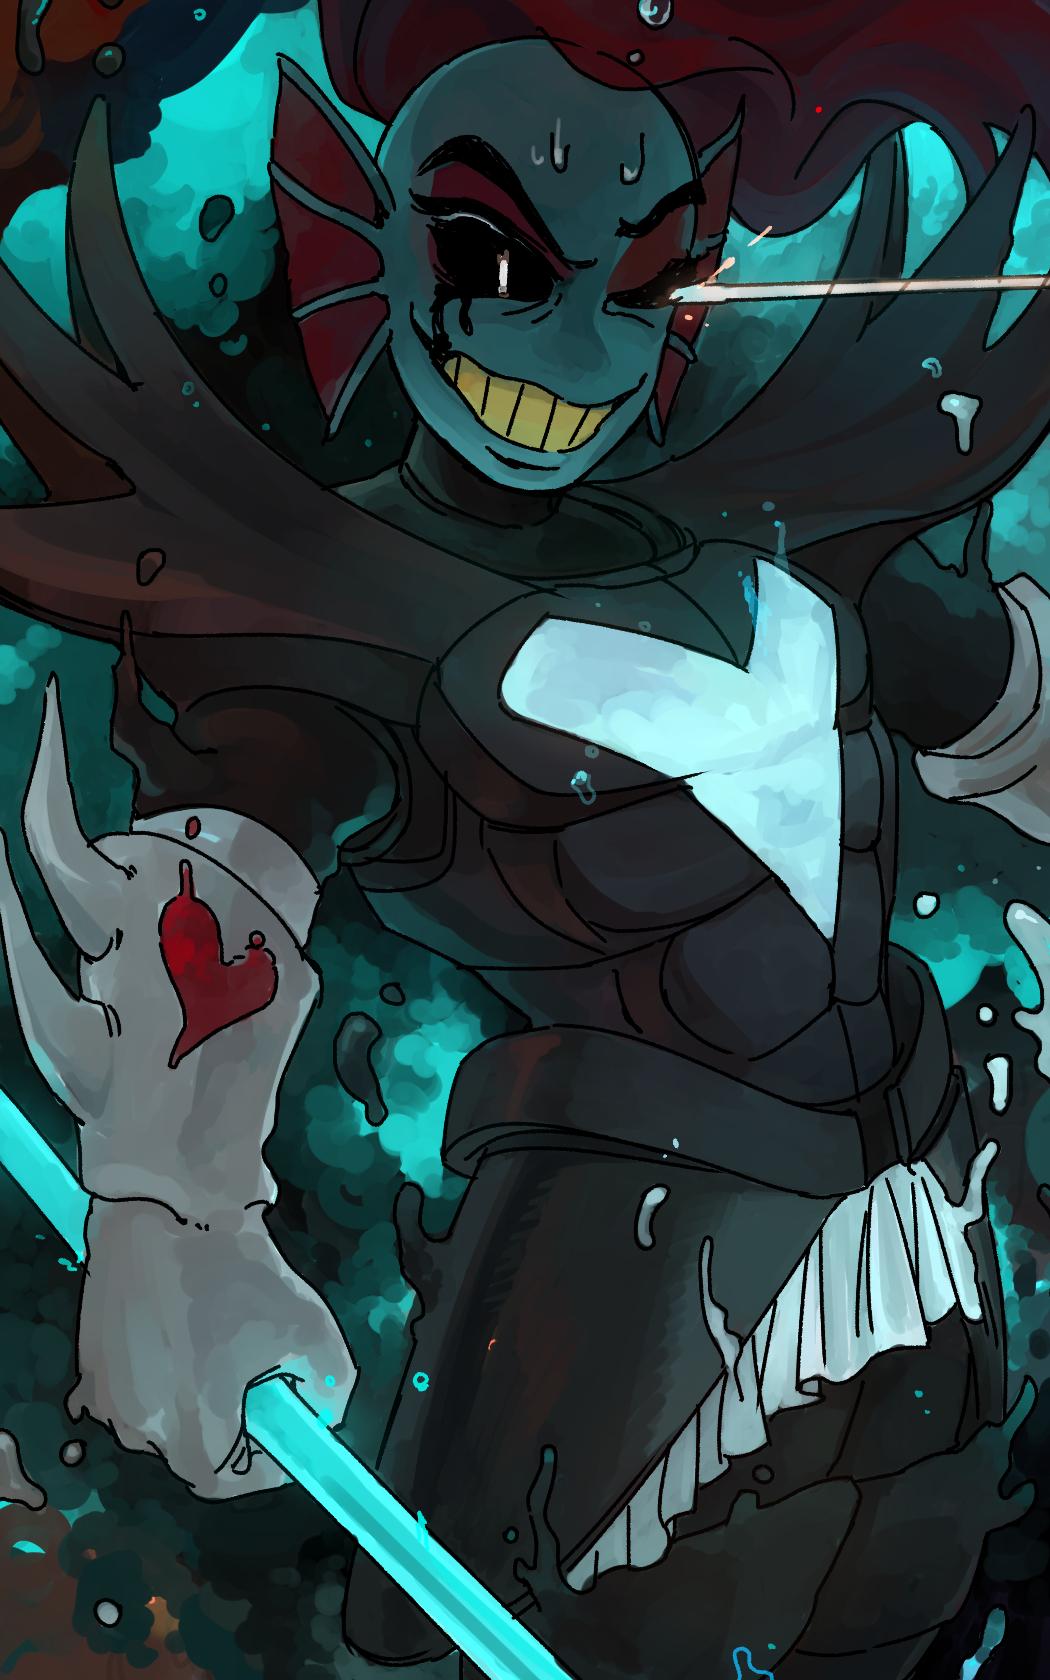 Undyne the Undying Image #2629526 - Zerochan Anime Image Board